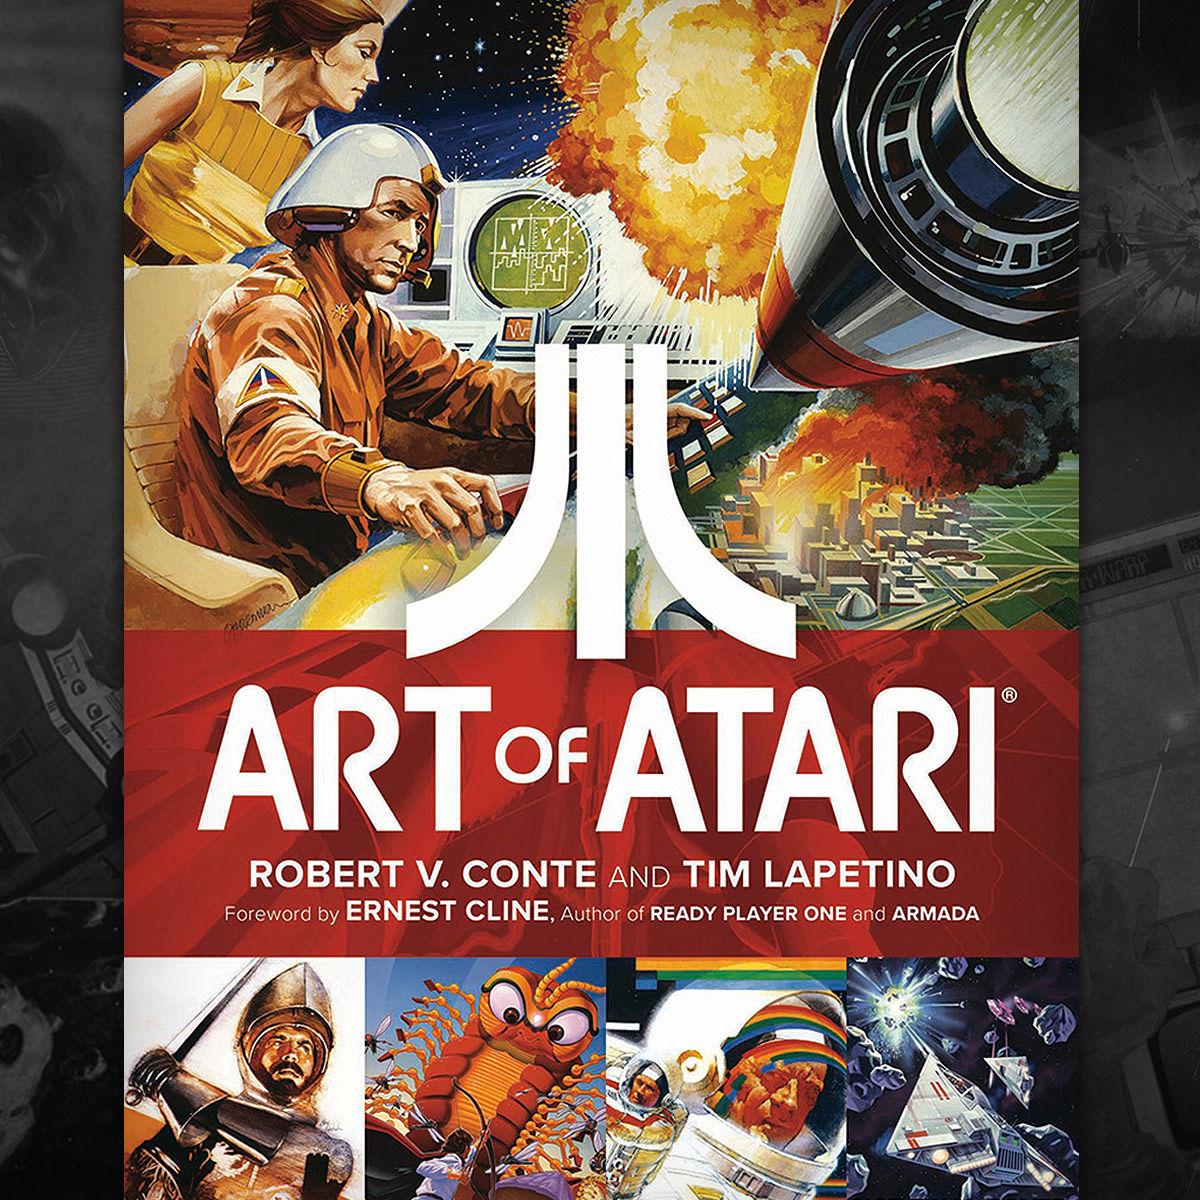 BookMonth_Atari_1920x1200.jpg